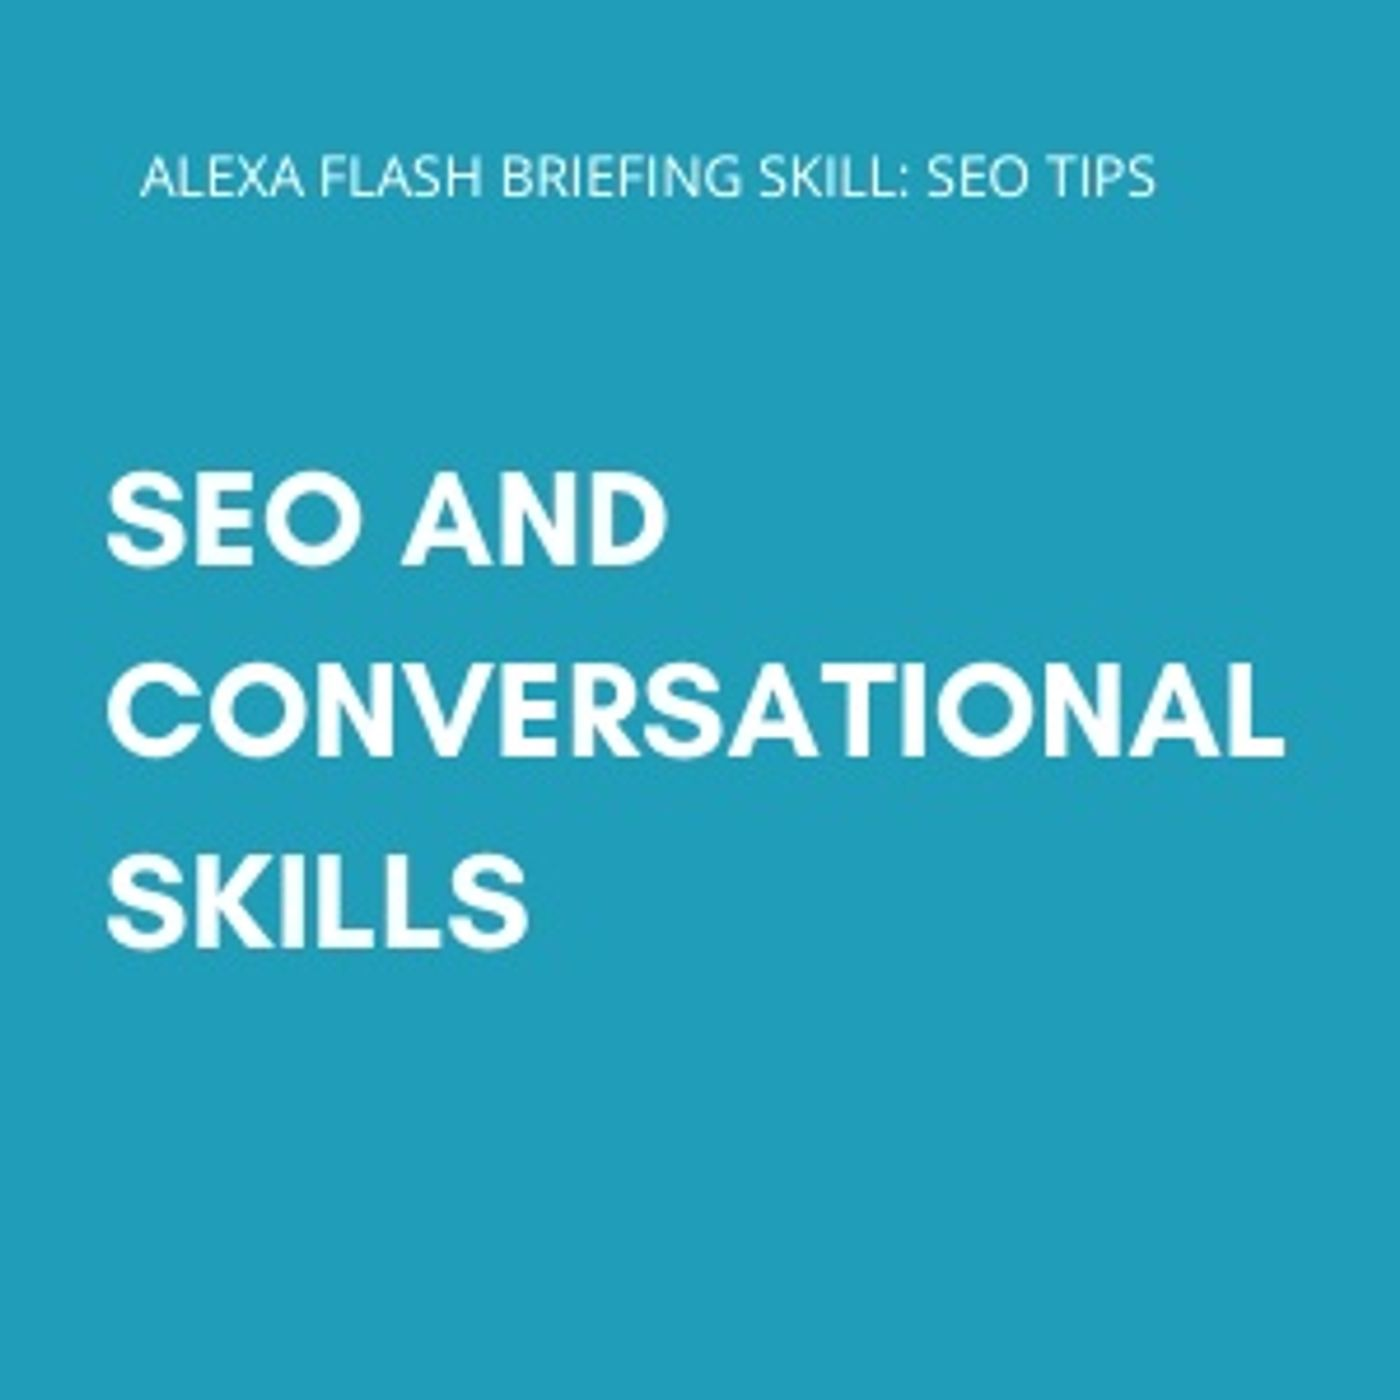 SEO and conversational skills